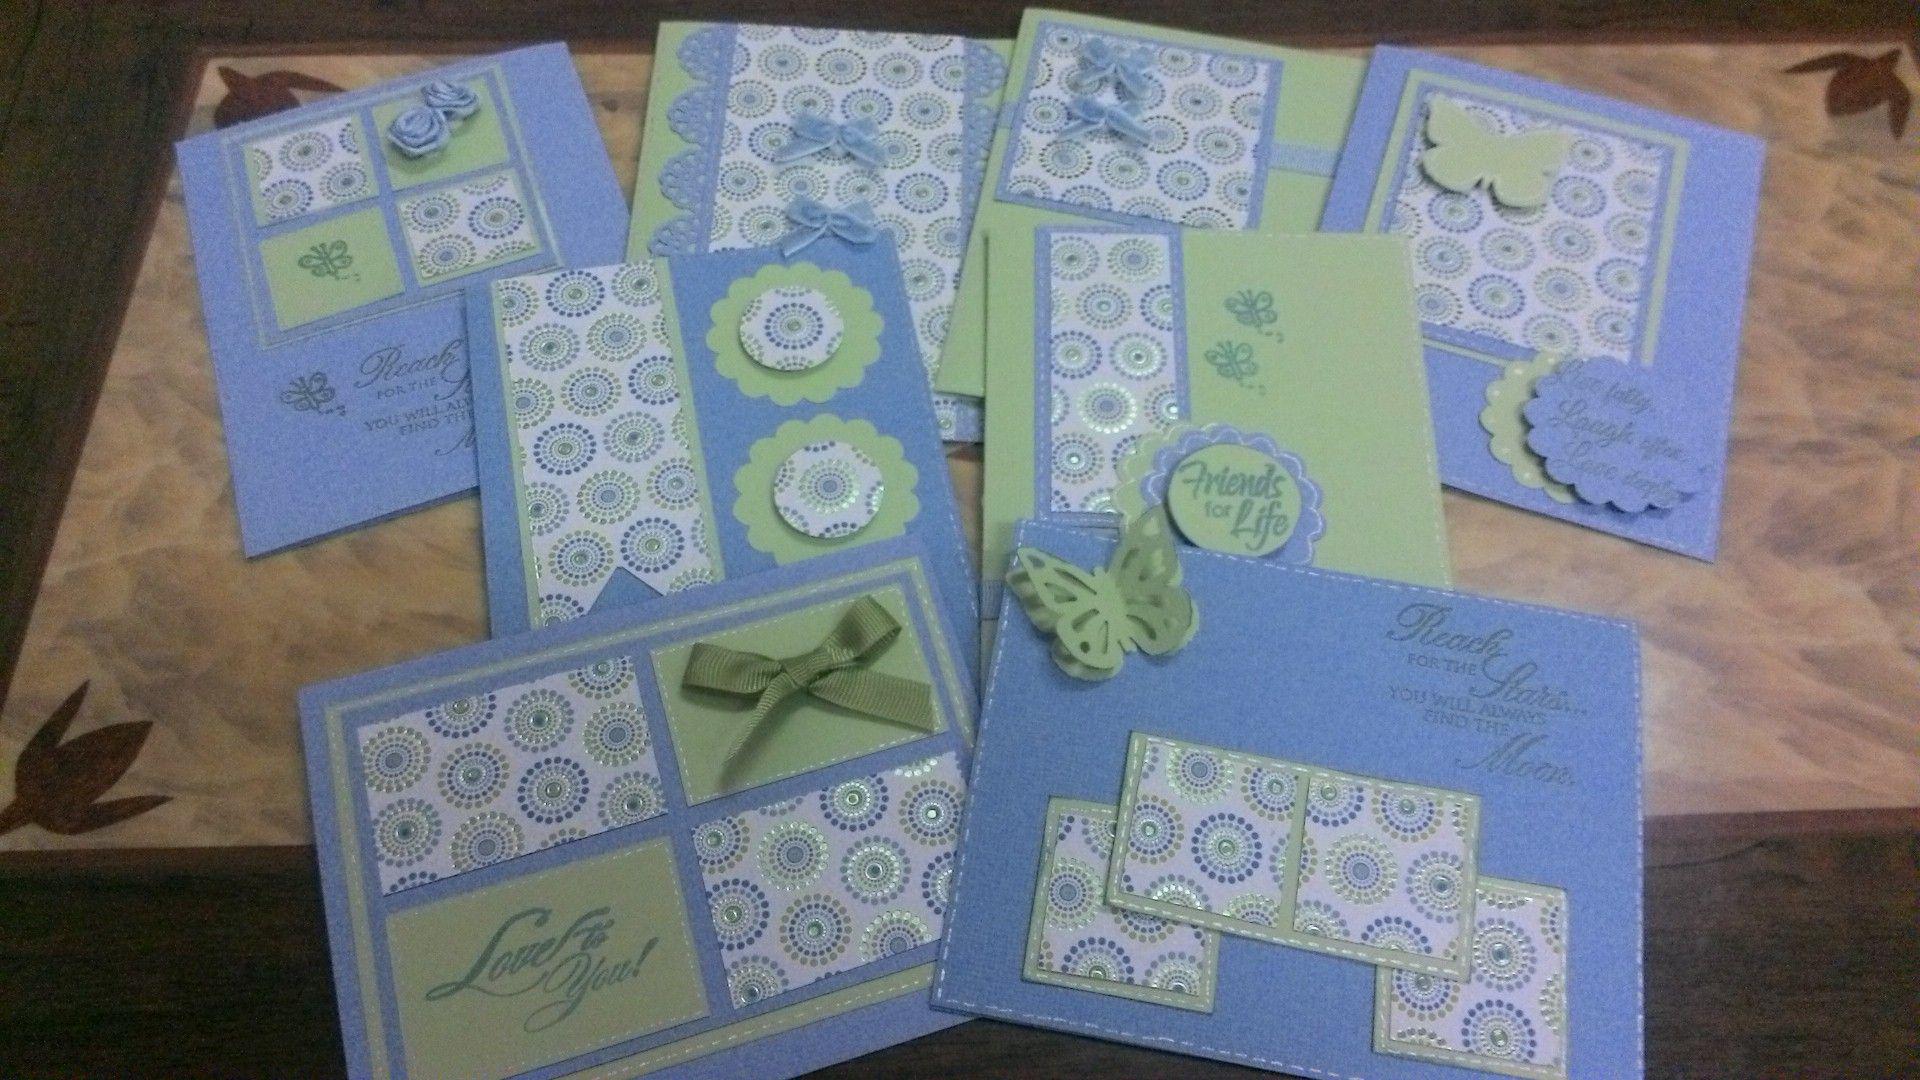 One sheet wonder cards | One sheet wonders | Pinterest ... - photo#20